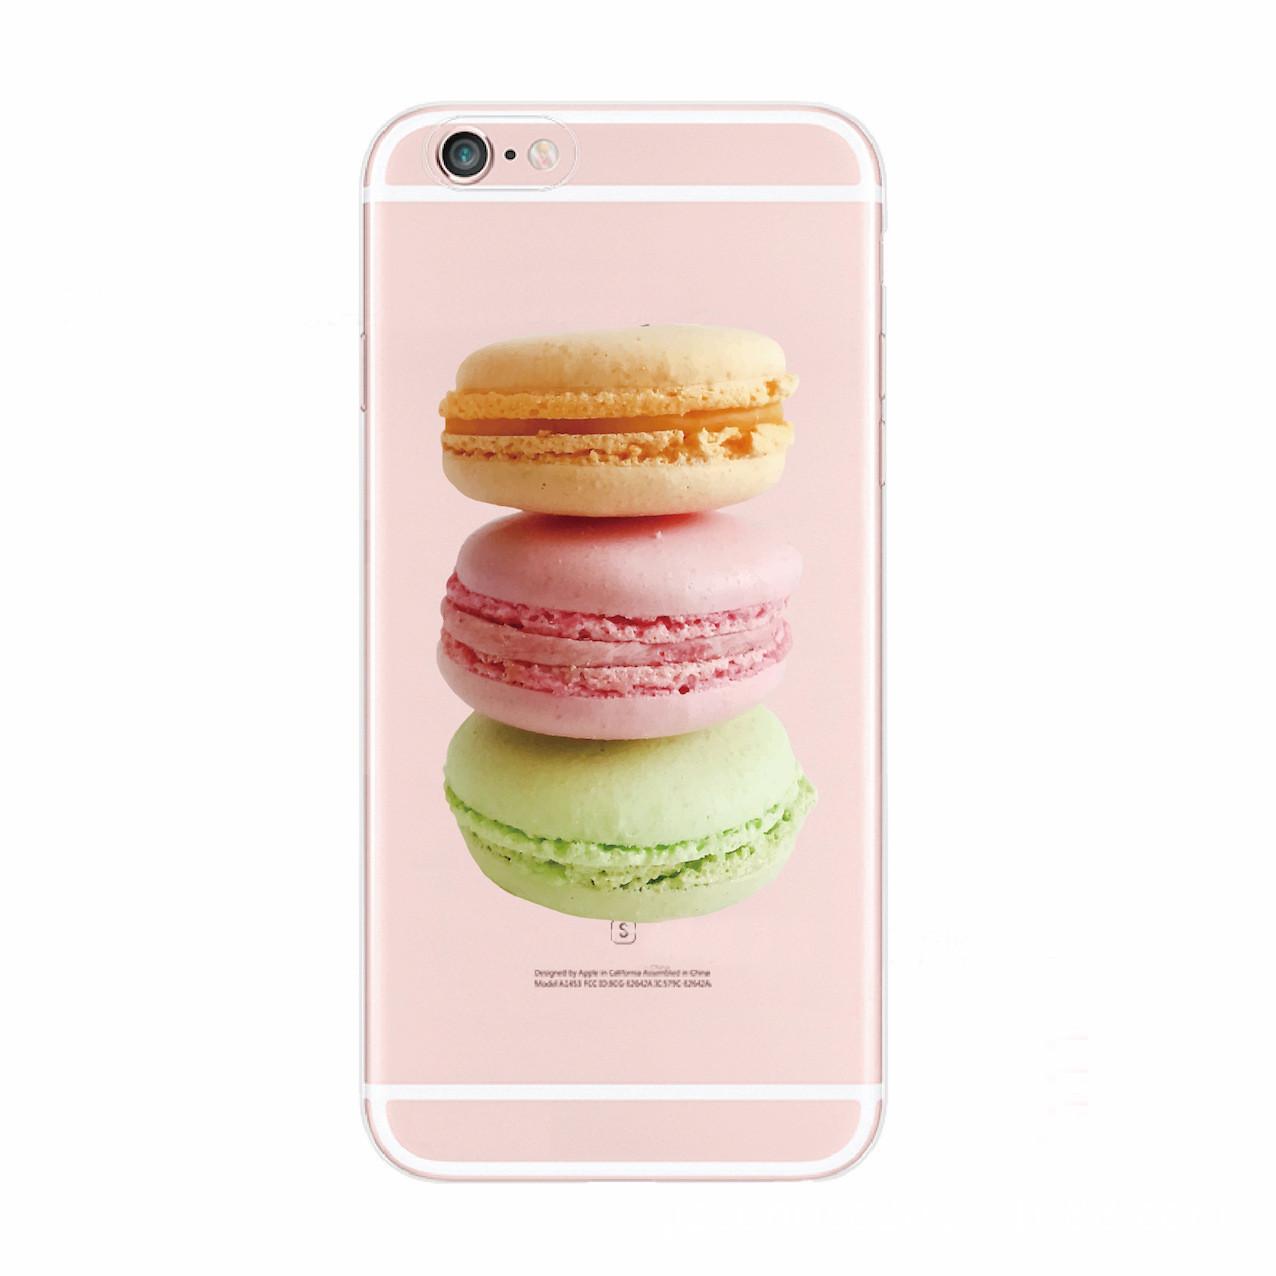 Чехол для iPhone 7 Plus/8 Plus прозрачный с макаронс